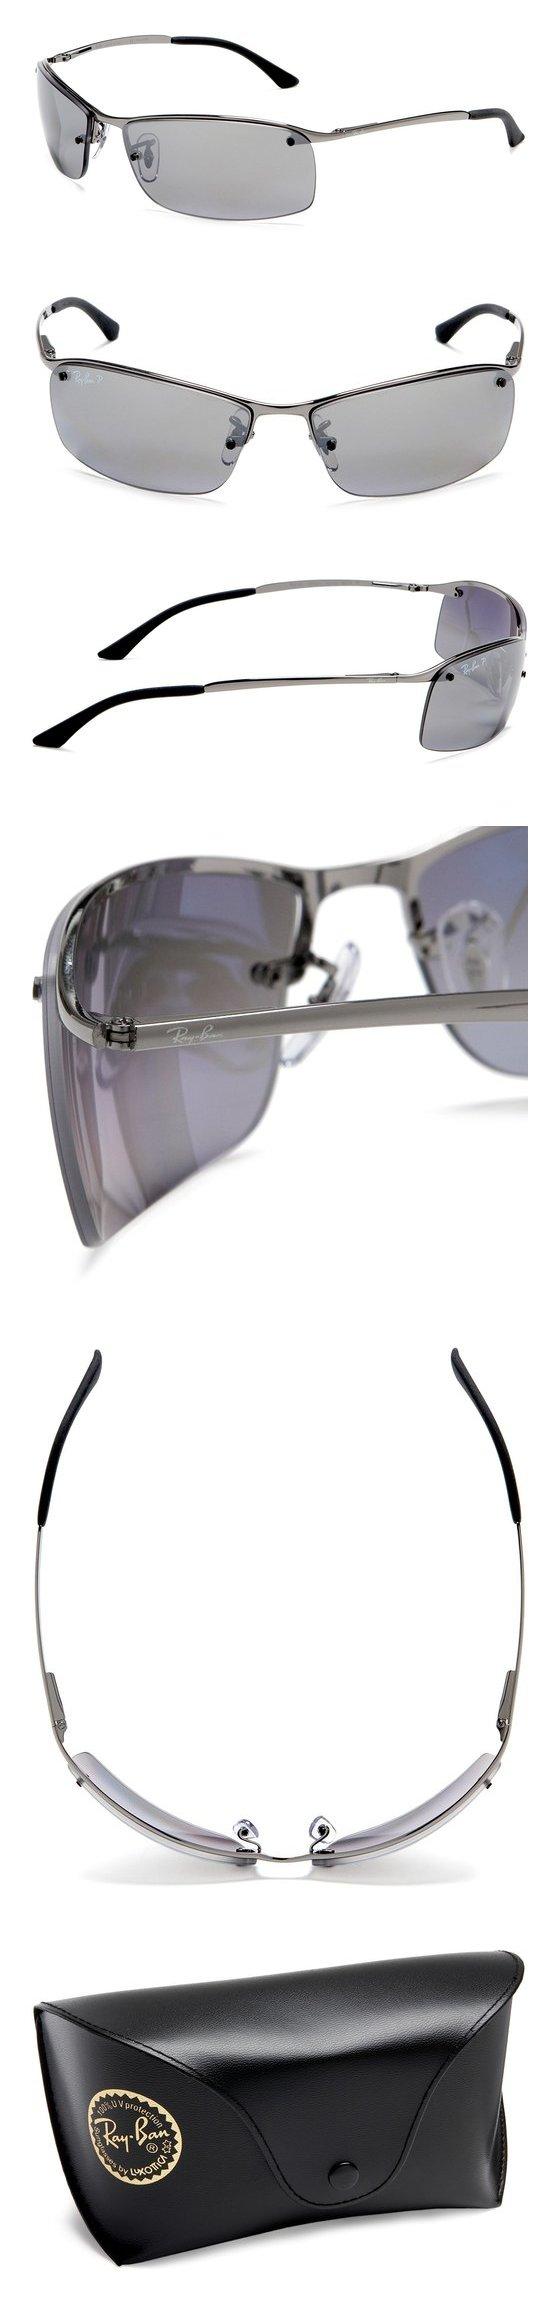 fc89575b7e7  121.99 - Ray-Ban RB3183 Sunglasses 63 mm Gunmetal POLAR GREY MIRROR SILVER  GRAD.